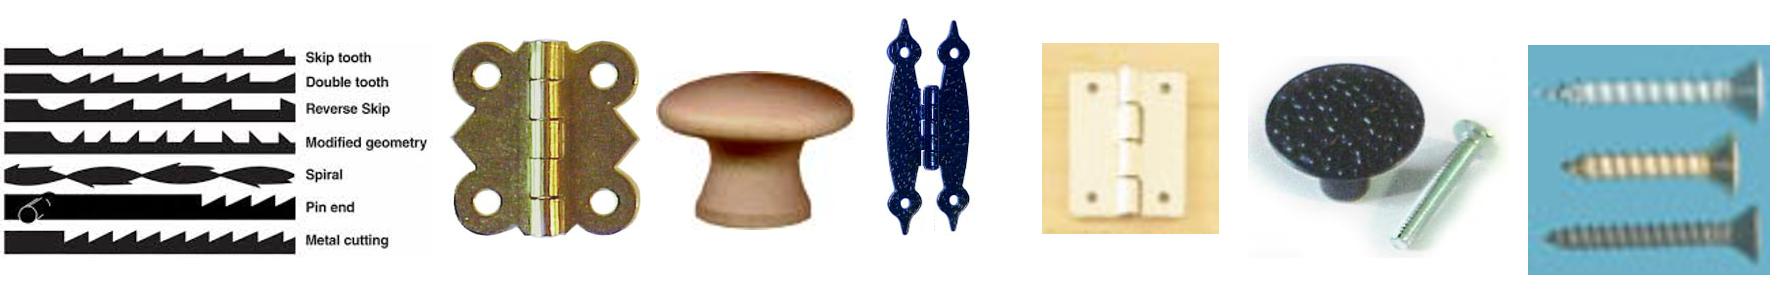 Hardware-knobs-saw-blades-hinges